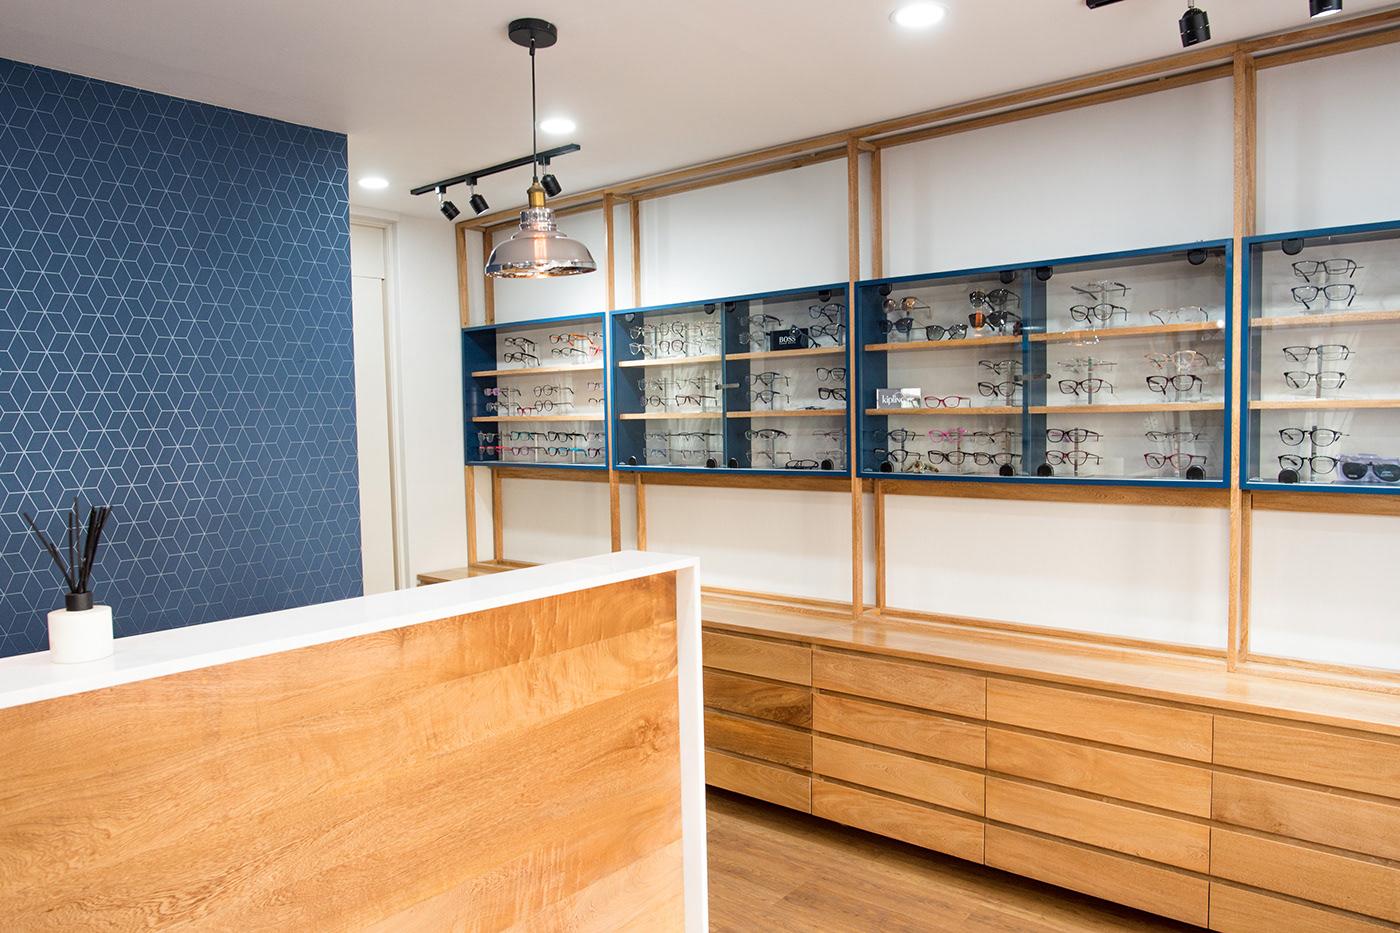 interior design  remodelacion Remodeling renovation